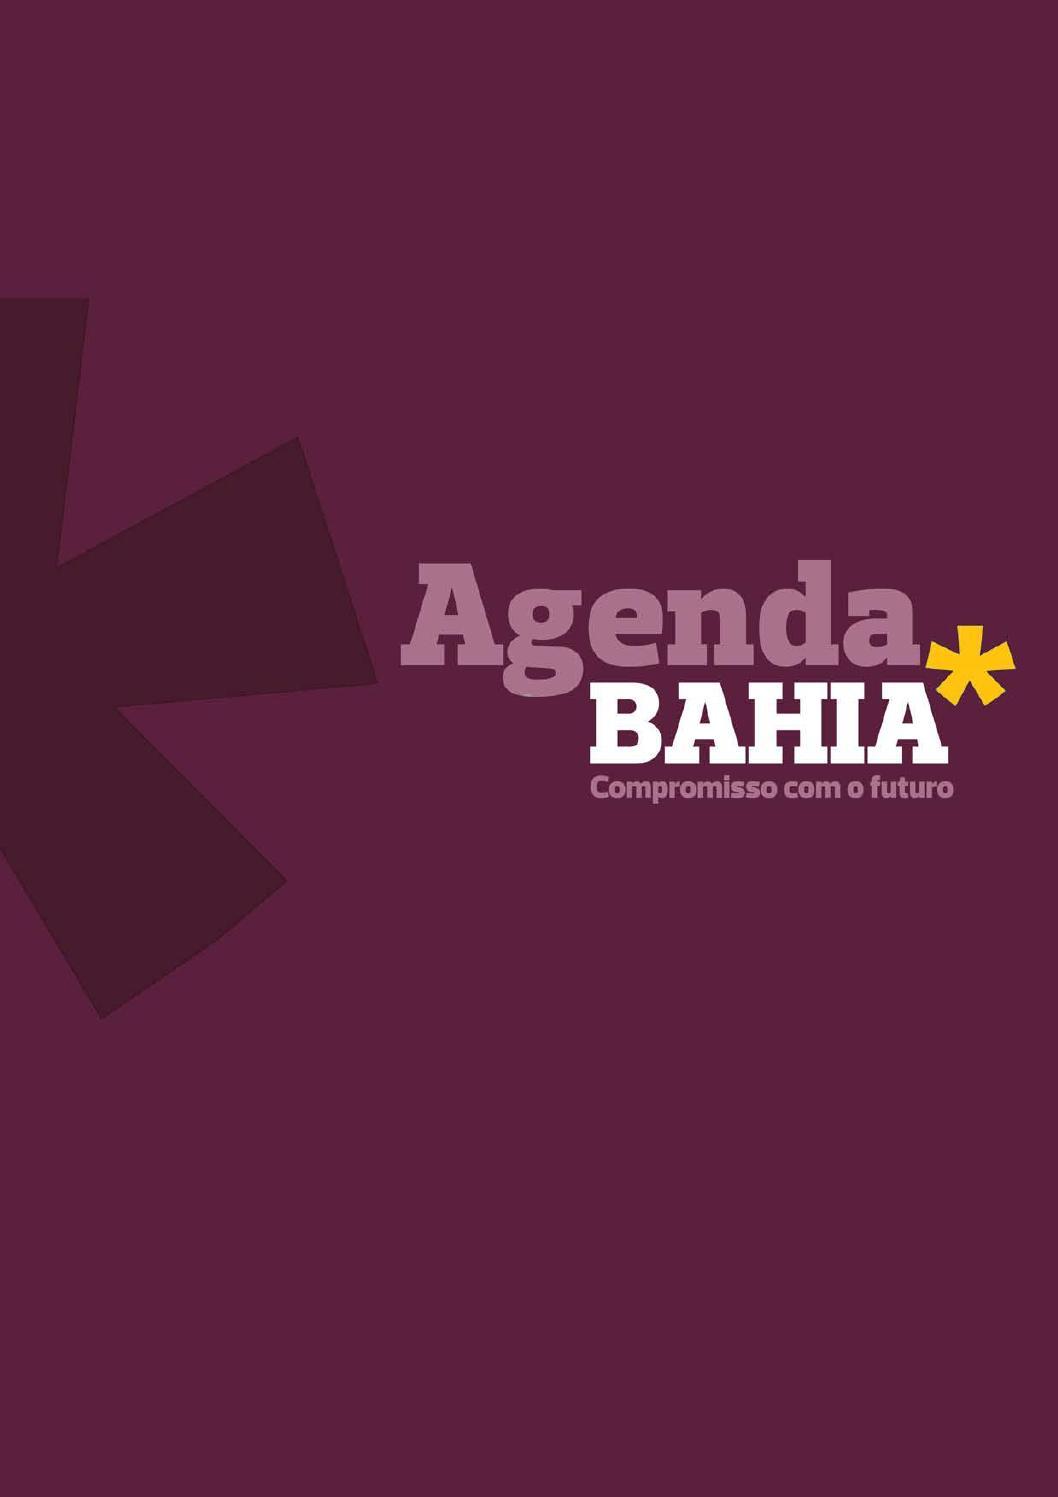 Livro Agenda Bahia 2011 by Jornal Correio - issuu 202dbe0116